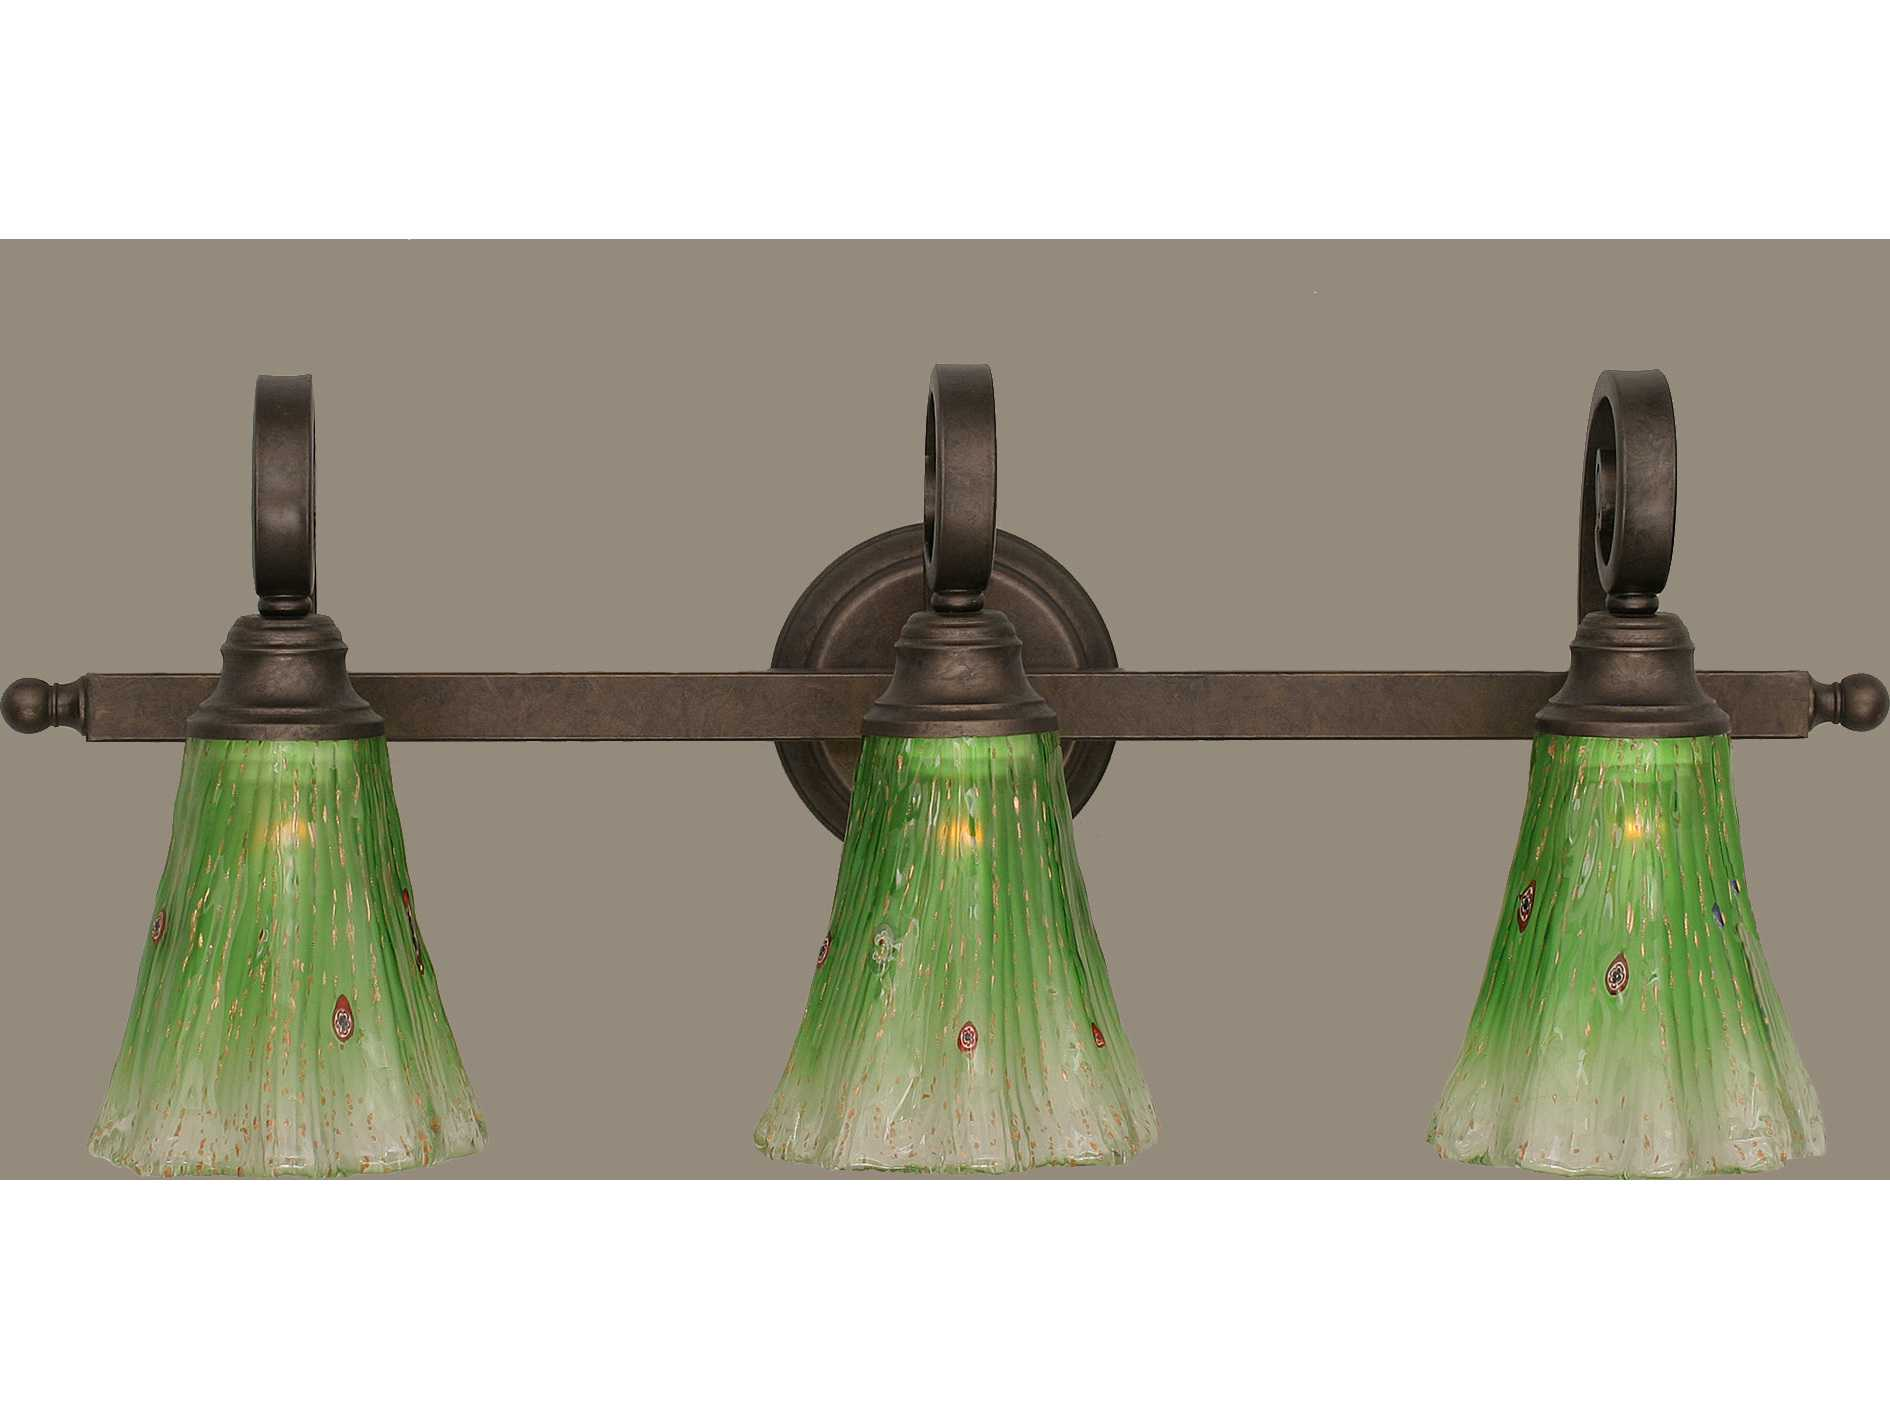 Toltec Lighting Curl Bronze & Kiwi Green Crystal Glass Three-Light Vanity Light TOL153BRZ723